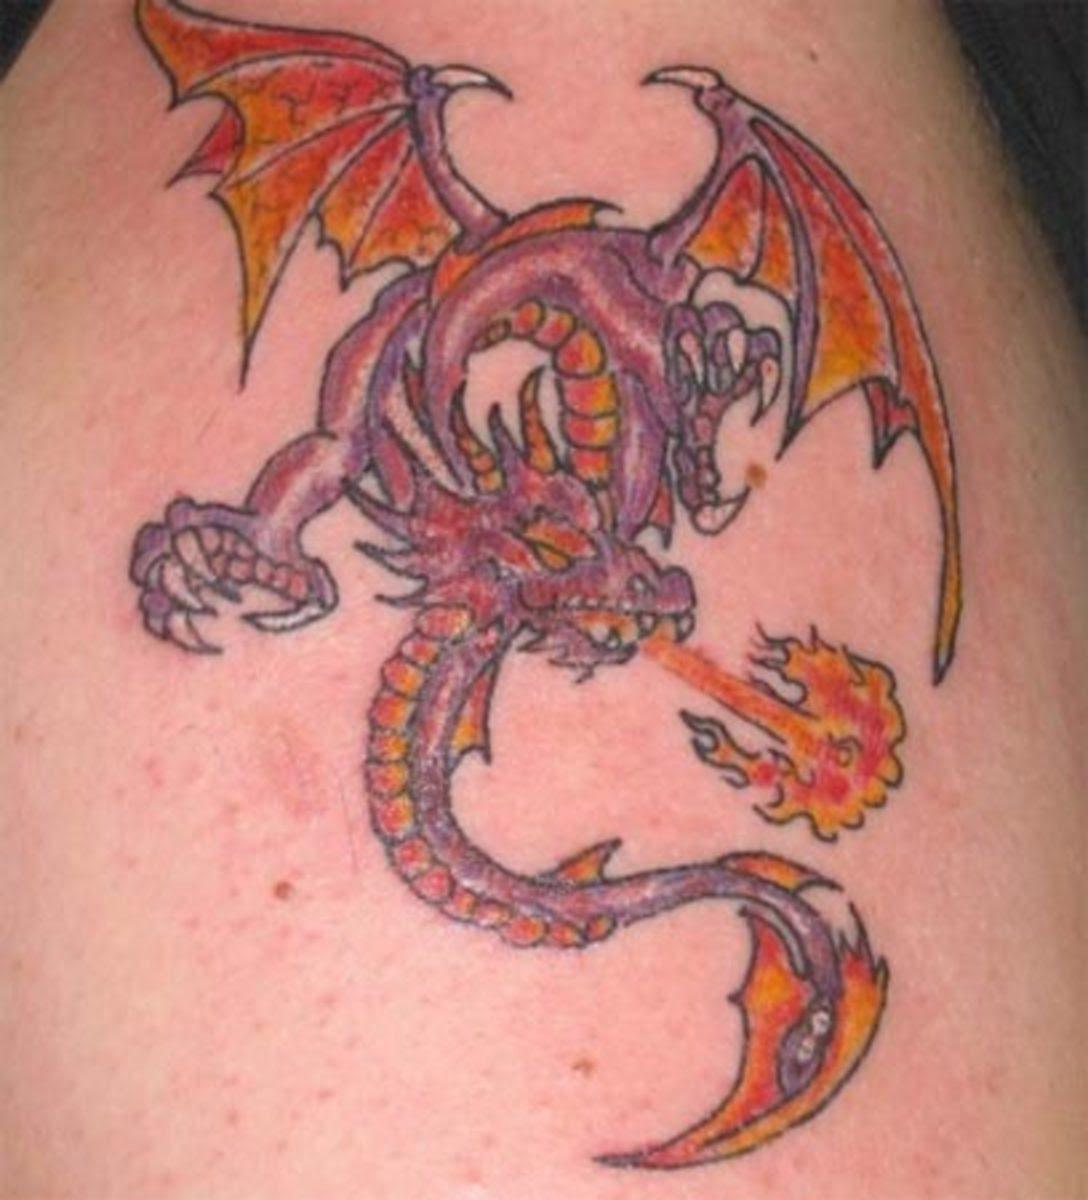 (by Kondo, Kondo´s Tattoo Studio, Buenos Aires, Argentina)